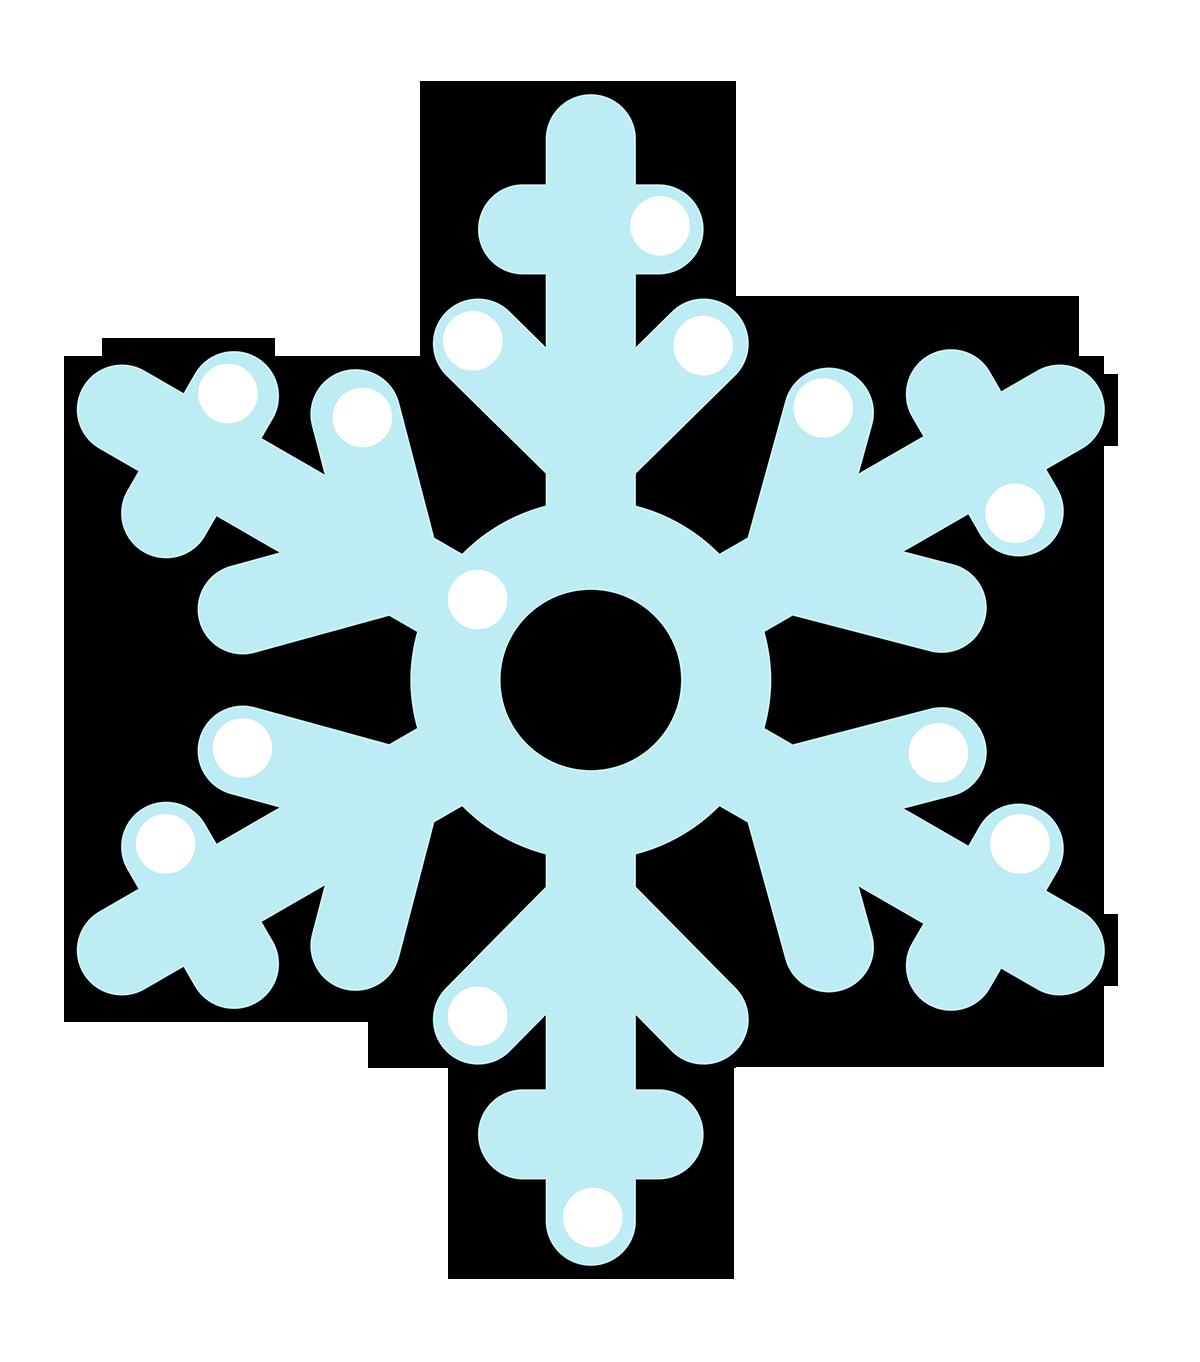 Free Cartoon Snowflake Clip Art u0026mid-Free Cartoon Snowflake Clip Art u0026middot; snowflake9-16